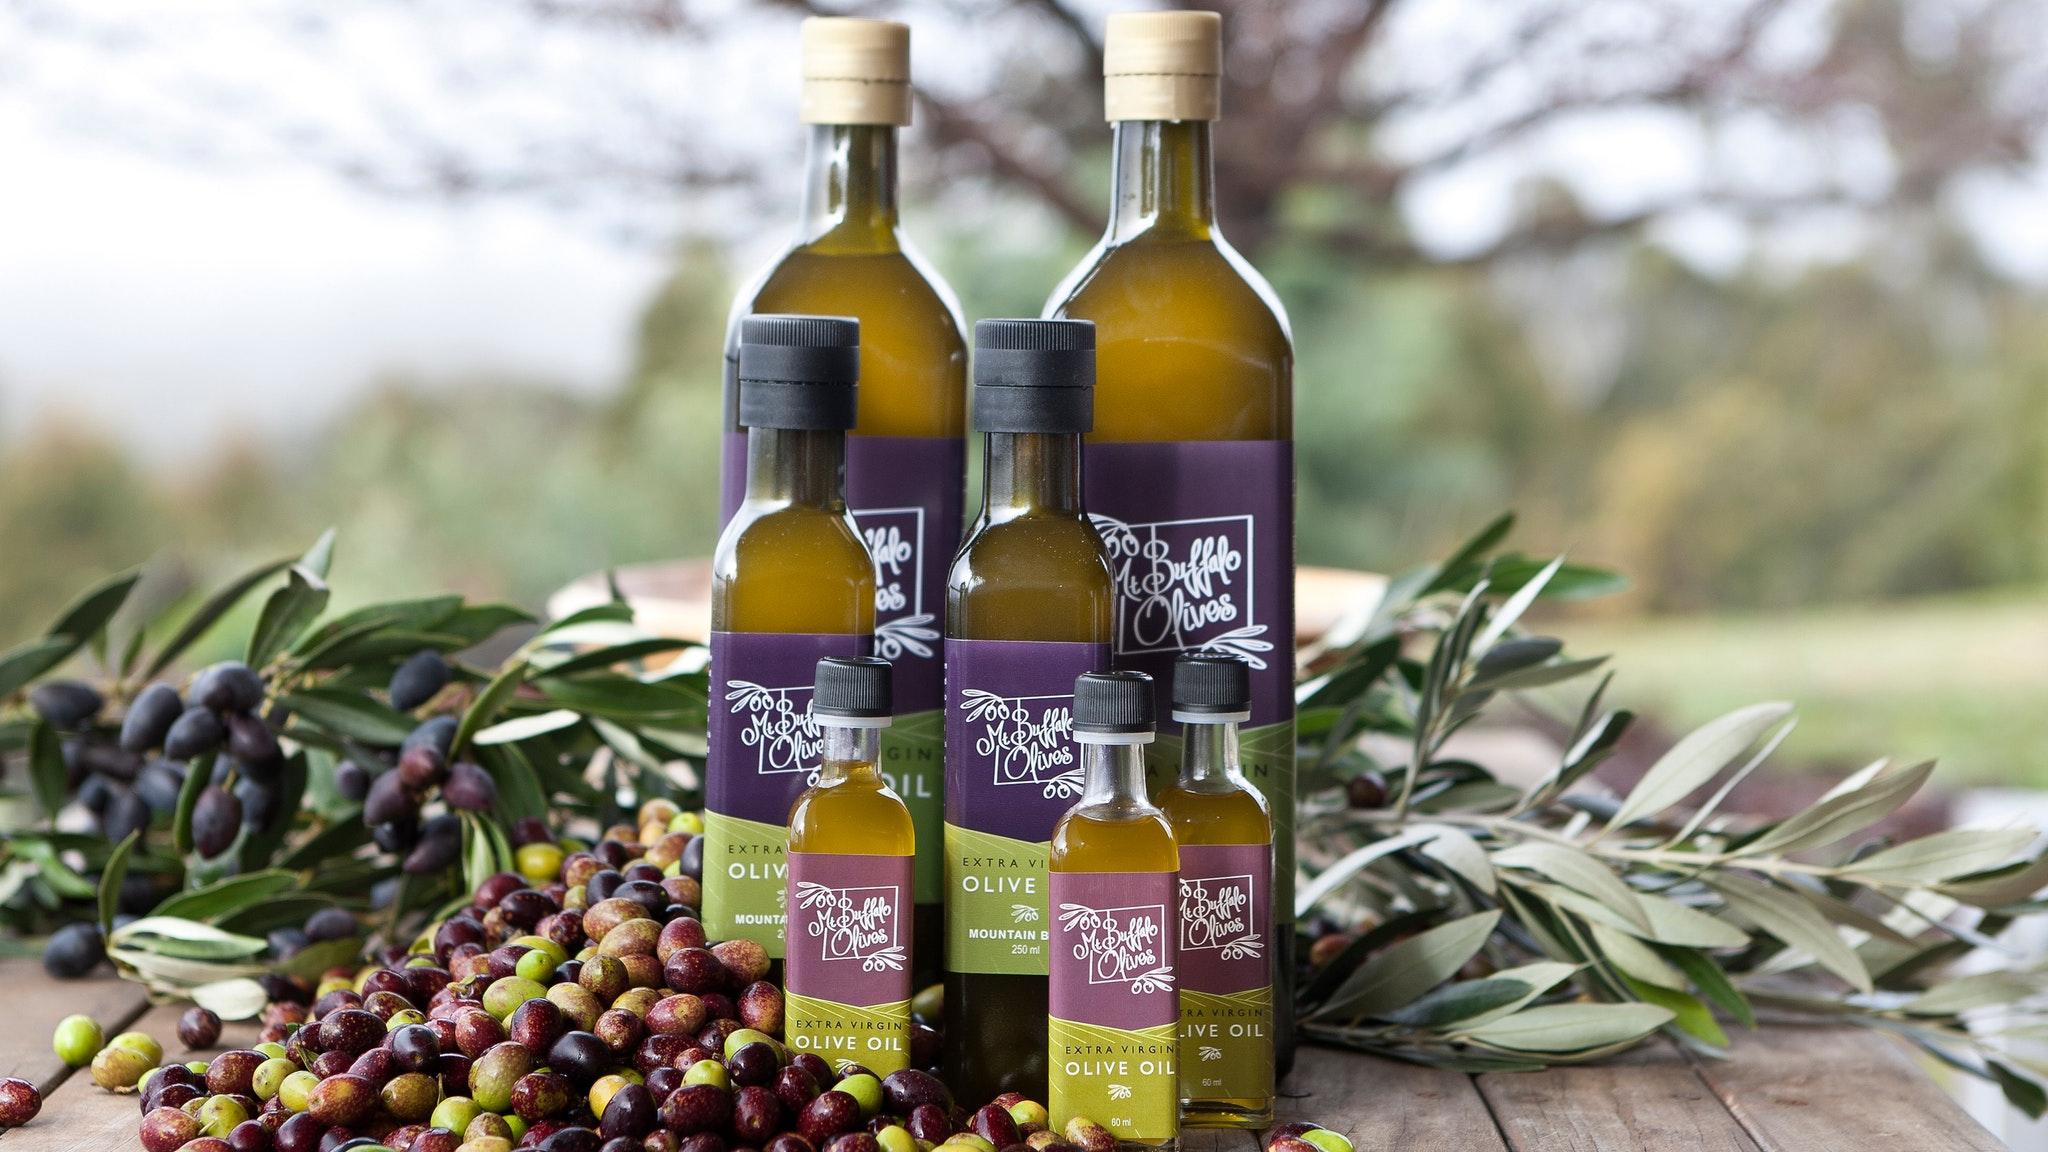 Mt Buffalo Olives Extra Virgin Olive Oil